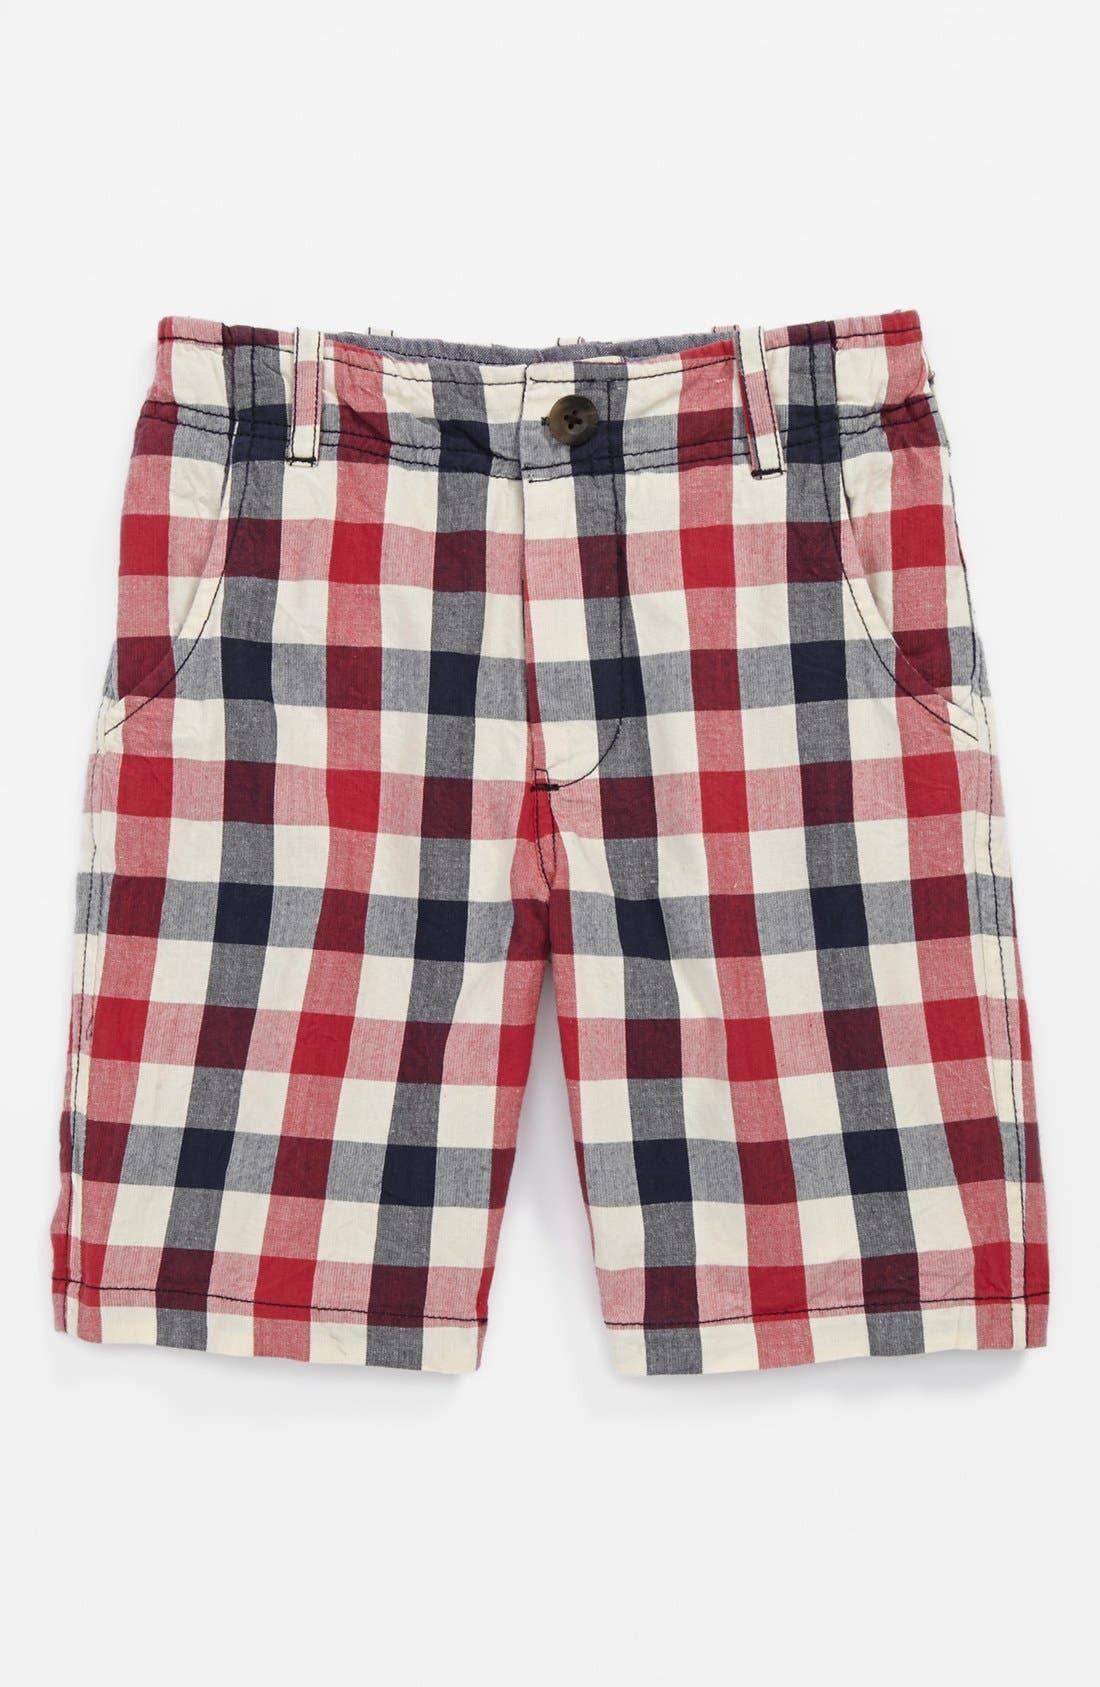 Alternate Image 1 Selected - Peek 'Newbury - Hampton' Shorts (Toddler Boys, Little Boys & Big Boys)